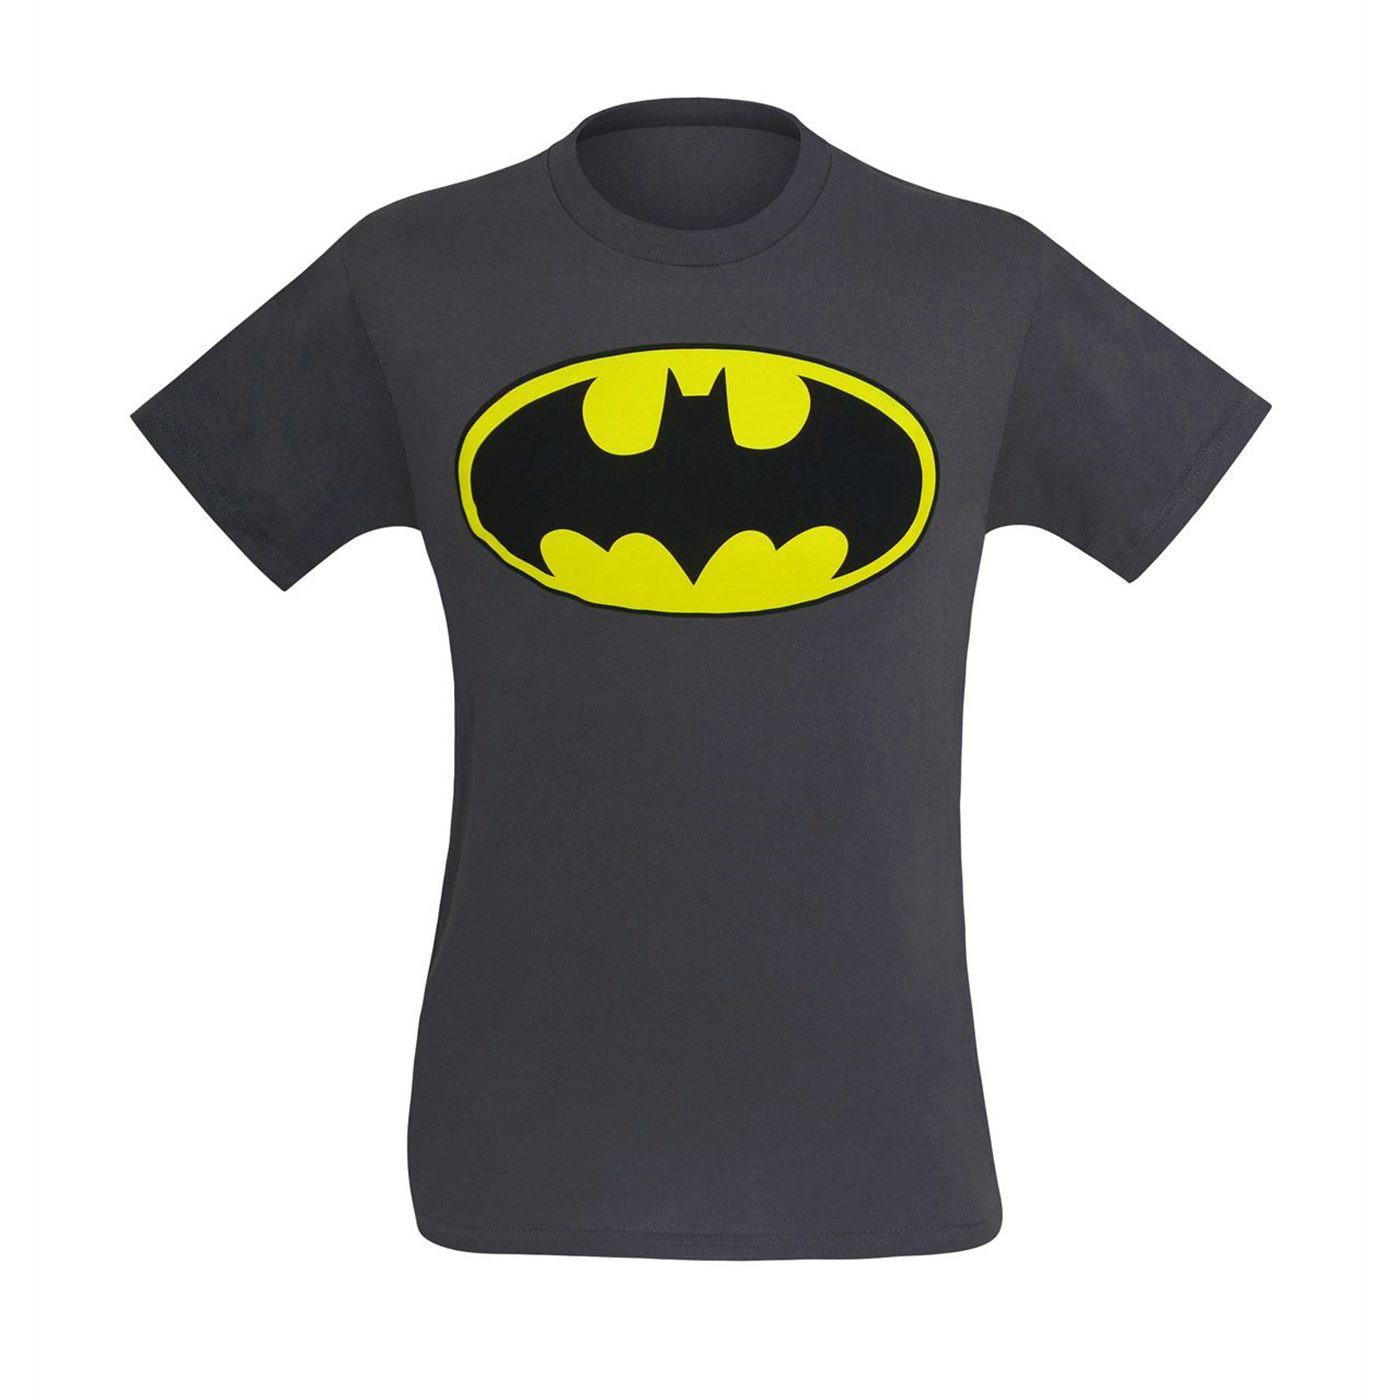 Batman Symbol T-Shirt on Grey